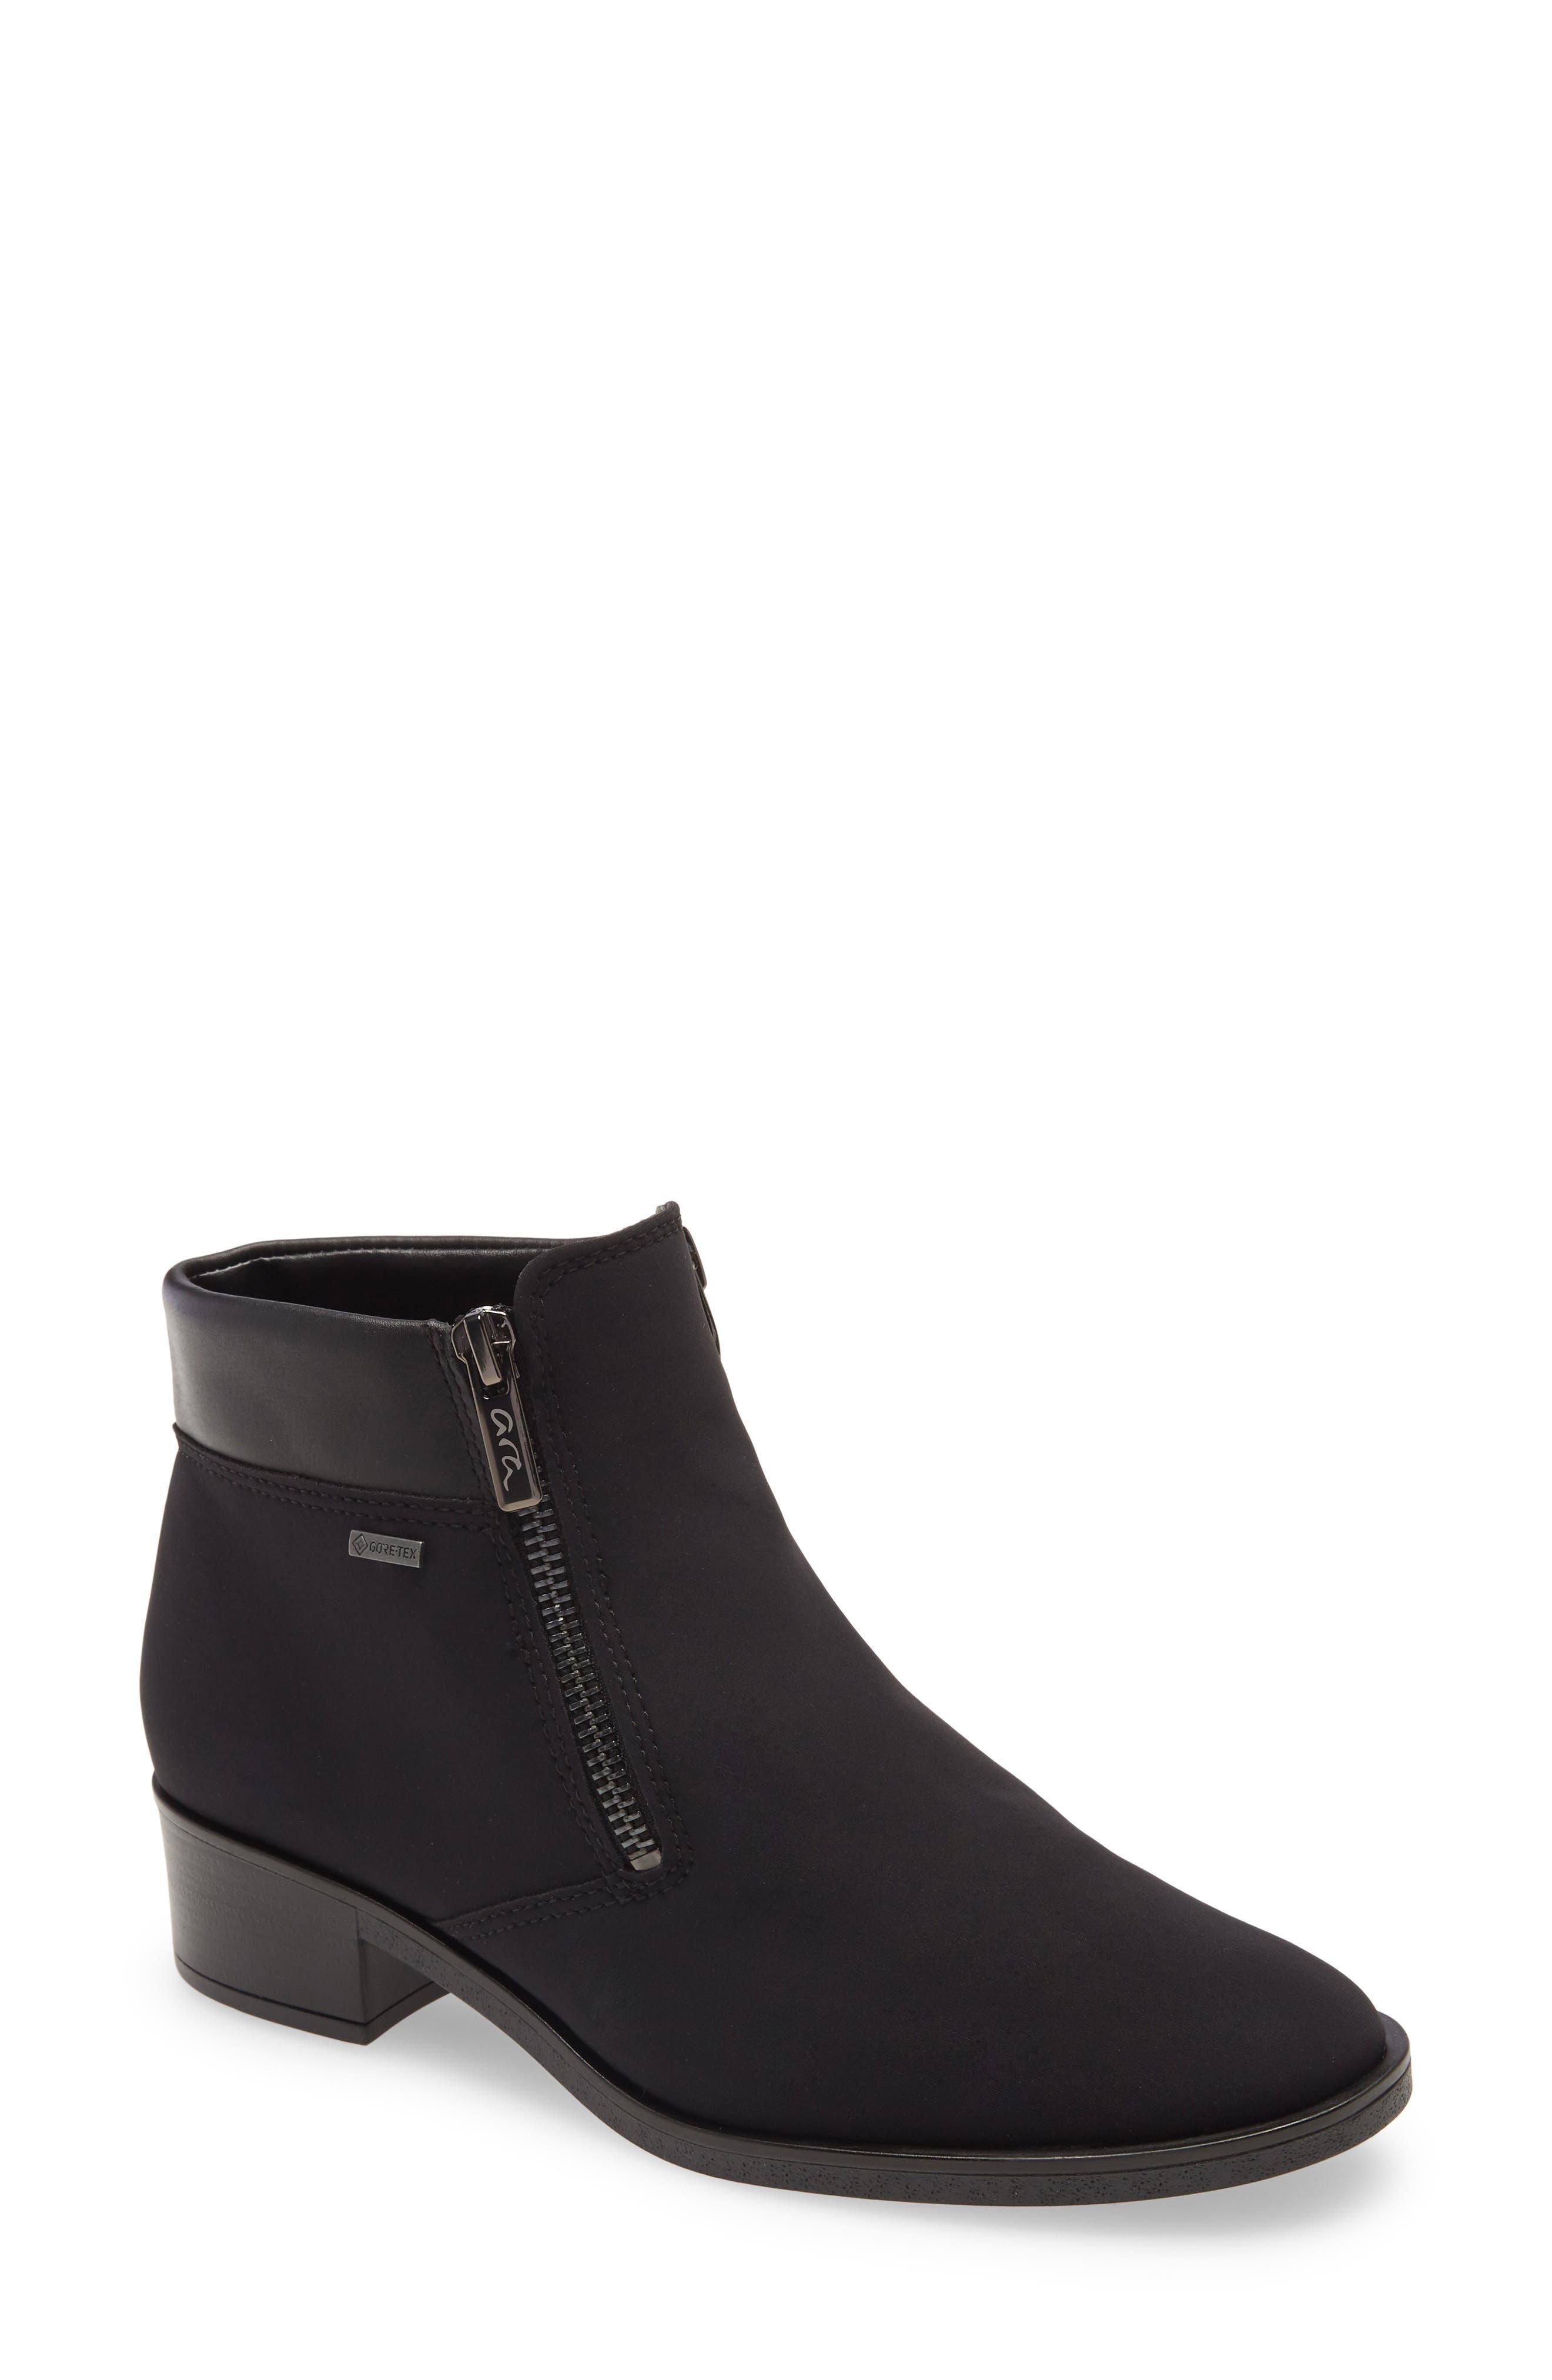 'Patty' Block Heel Boot